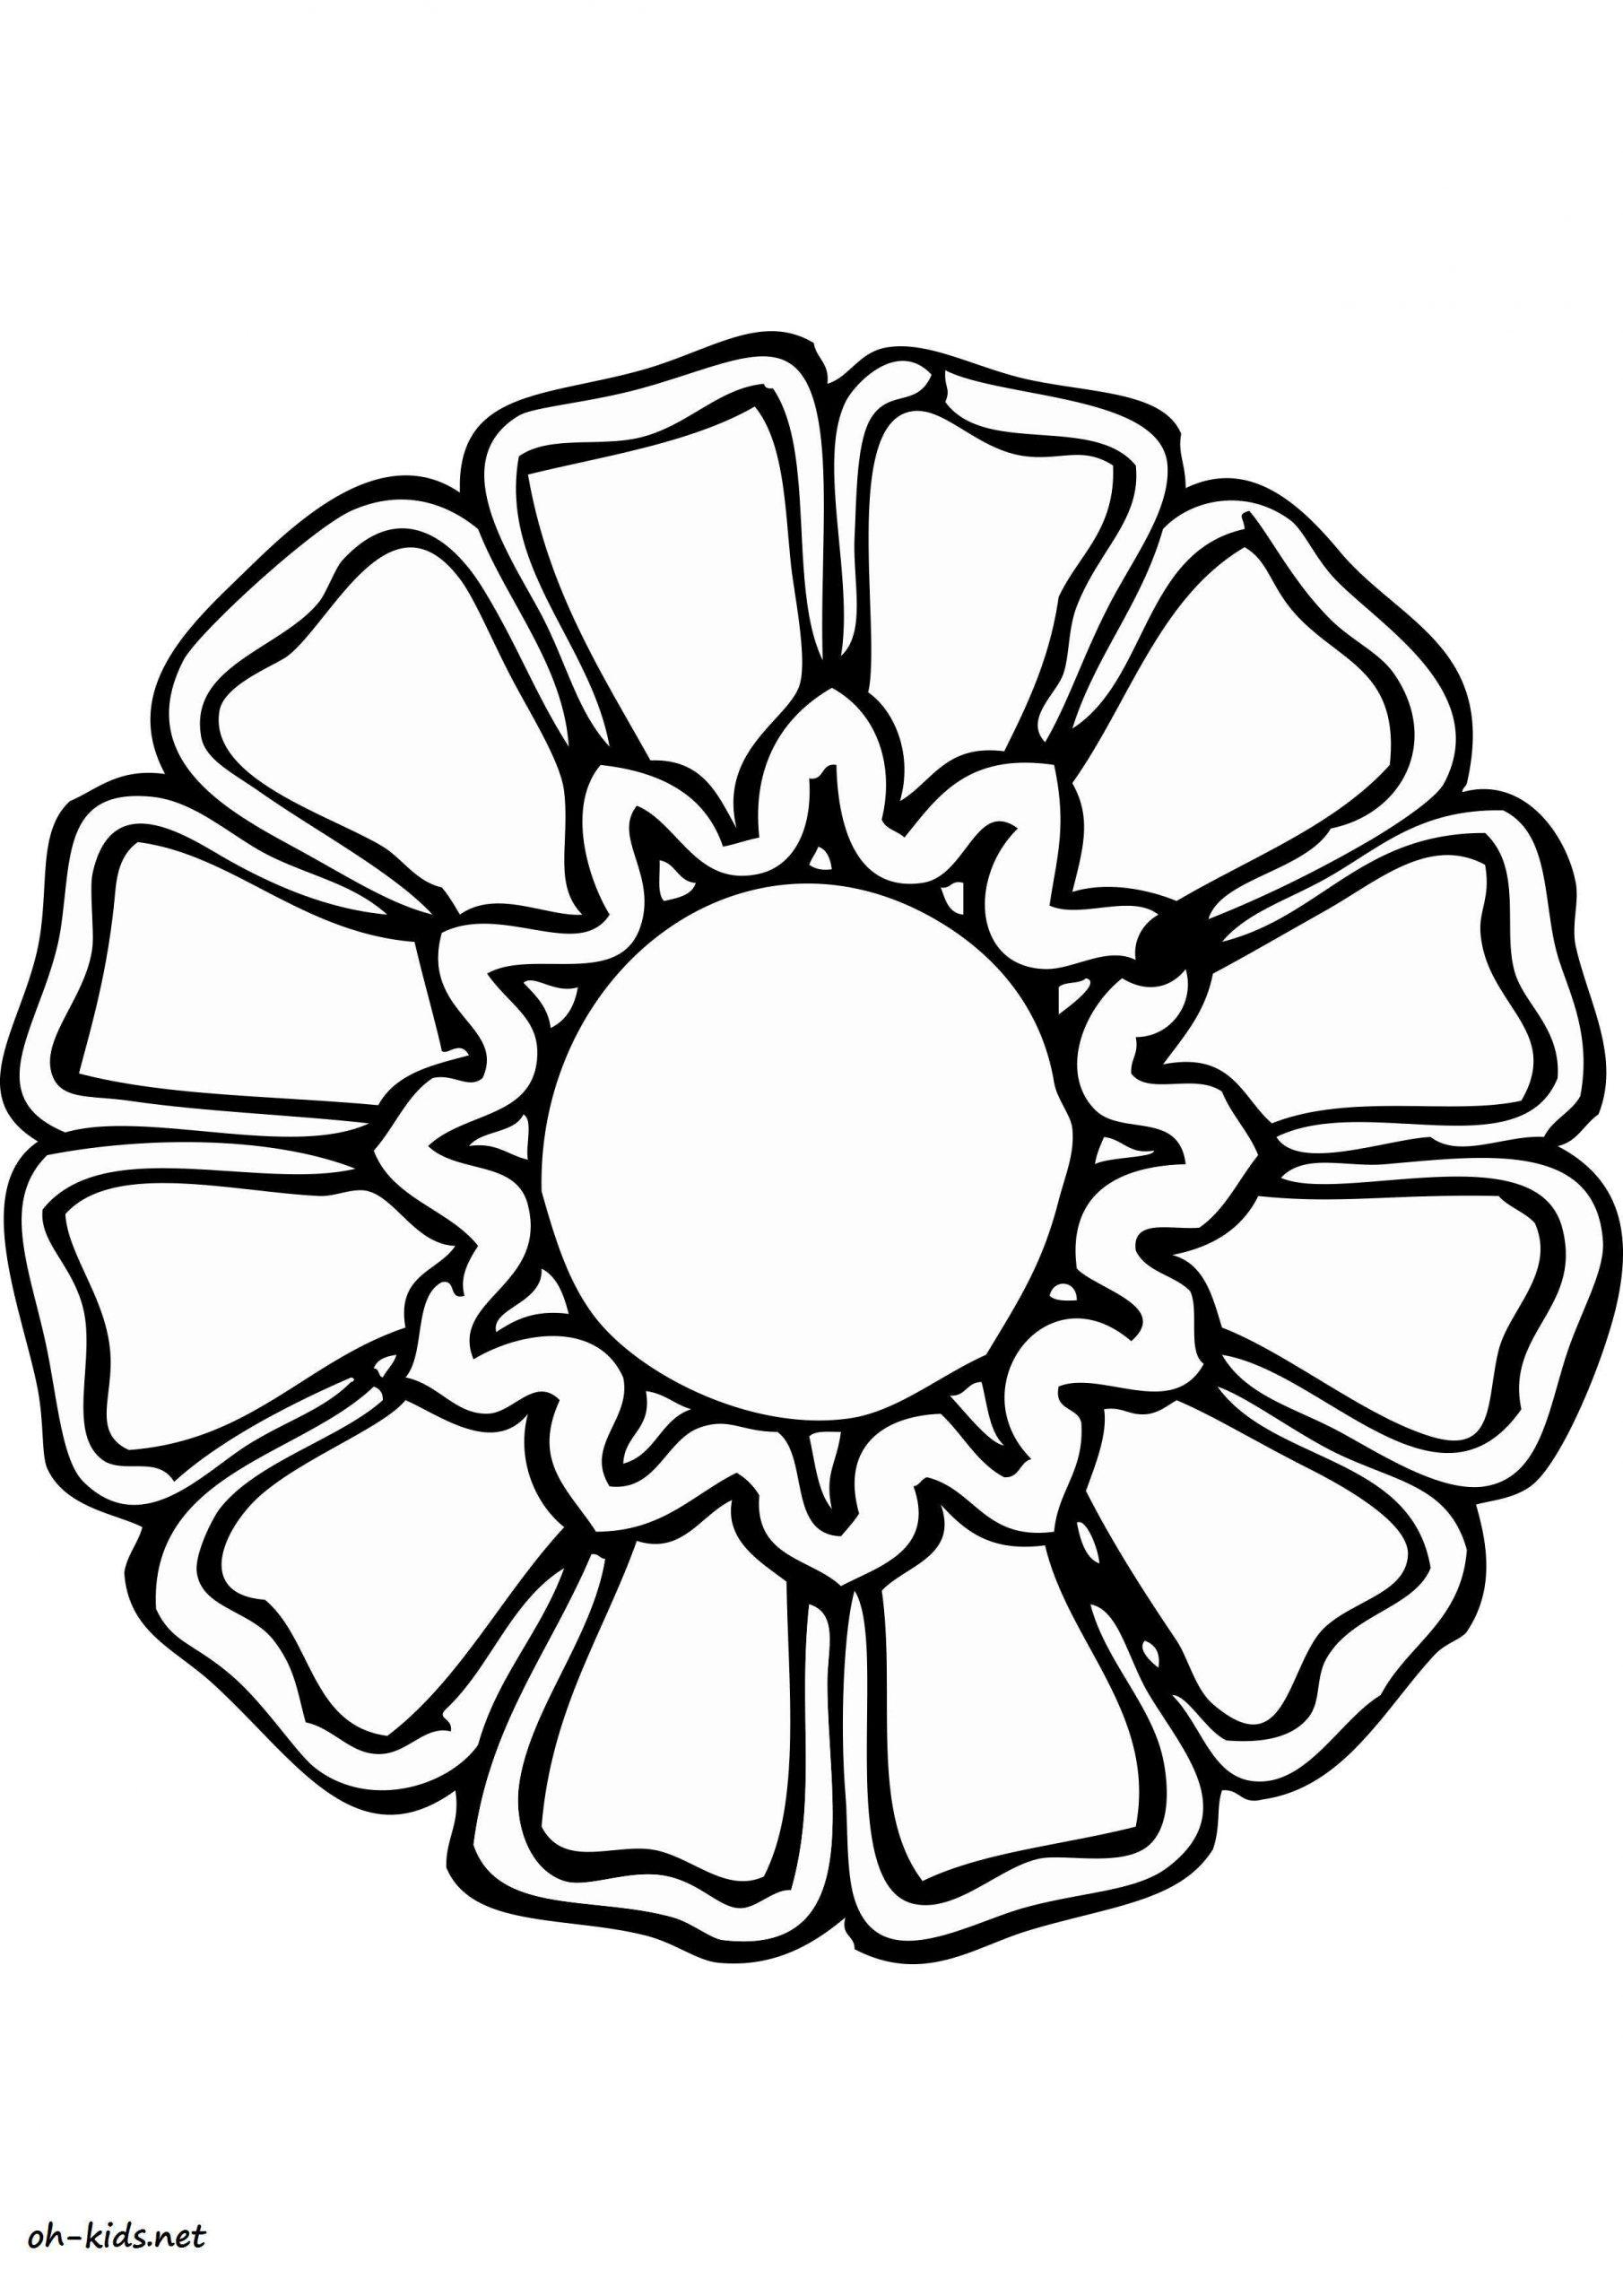 Dessin #1172 - Coloriage Rosace À Imprimer - Oh-Kids encequiconcerne Rosace A Imprimer